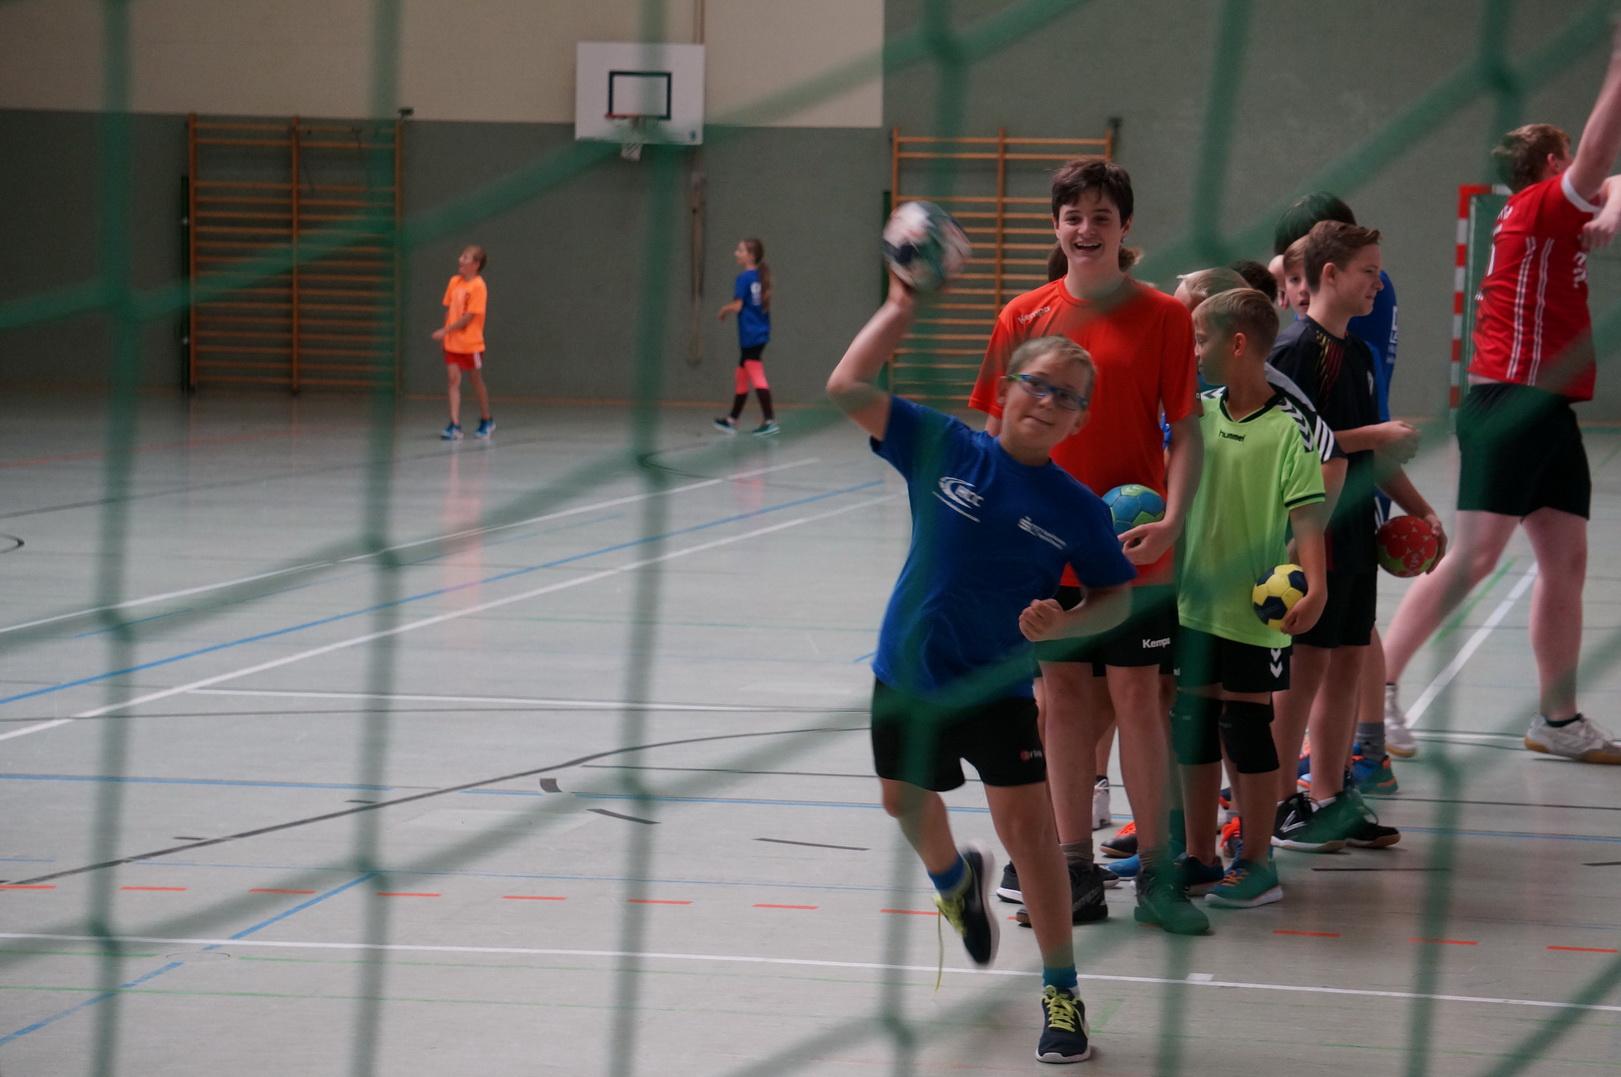 201808_Handballcamp_SDH_MG_135w